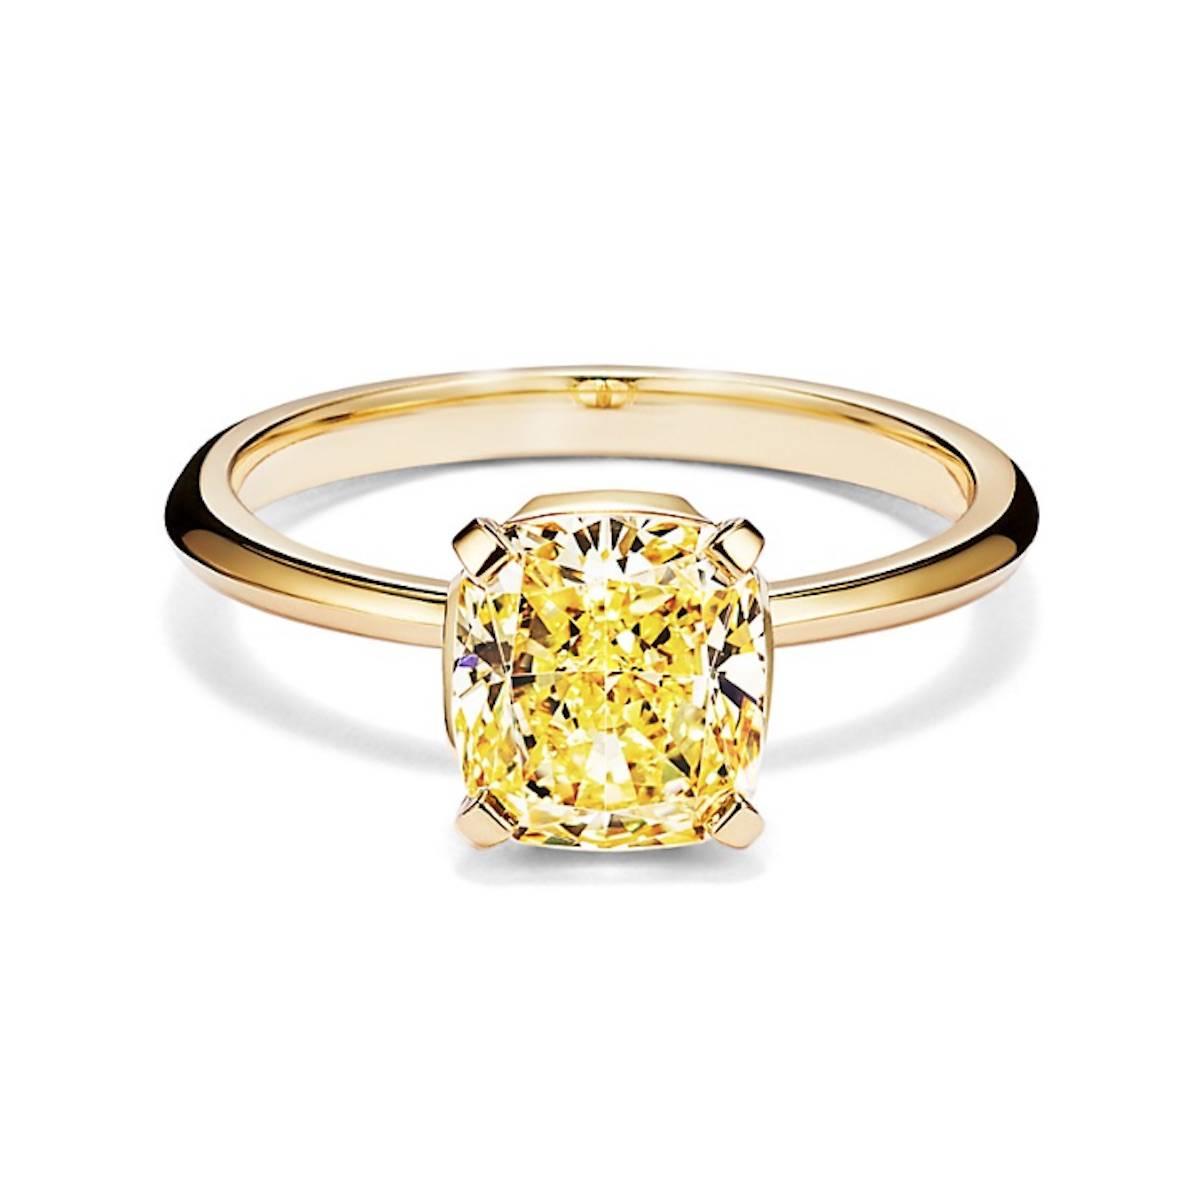 Кольцо с канареечным желтым бриллиантом от TIffany & Co.  (Фото: материалы прессы)